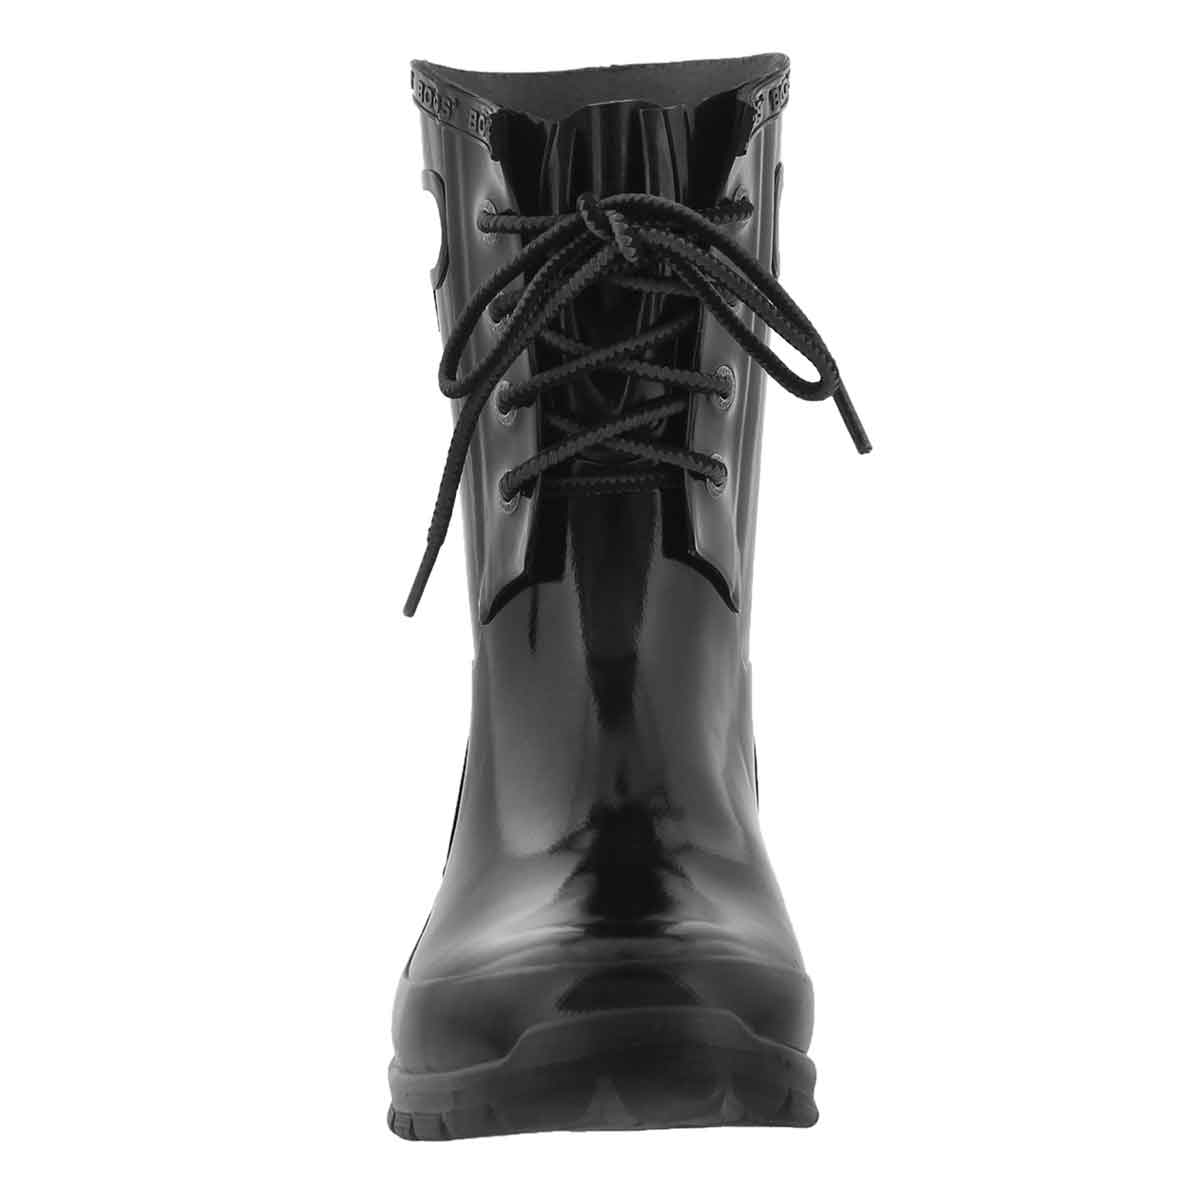 Lds Amanda 4-Eye black wtpf rain boot